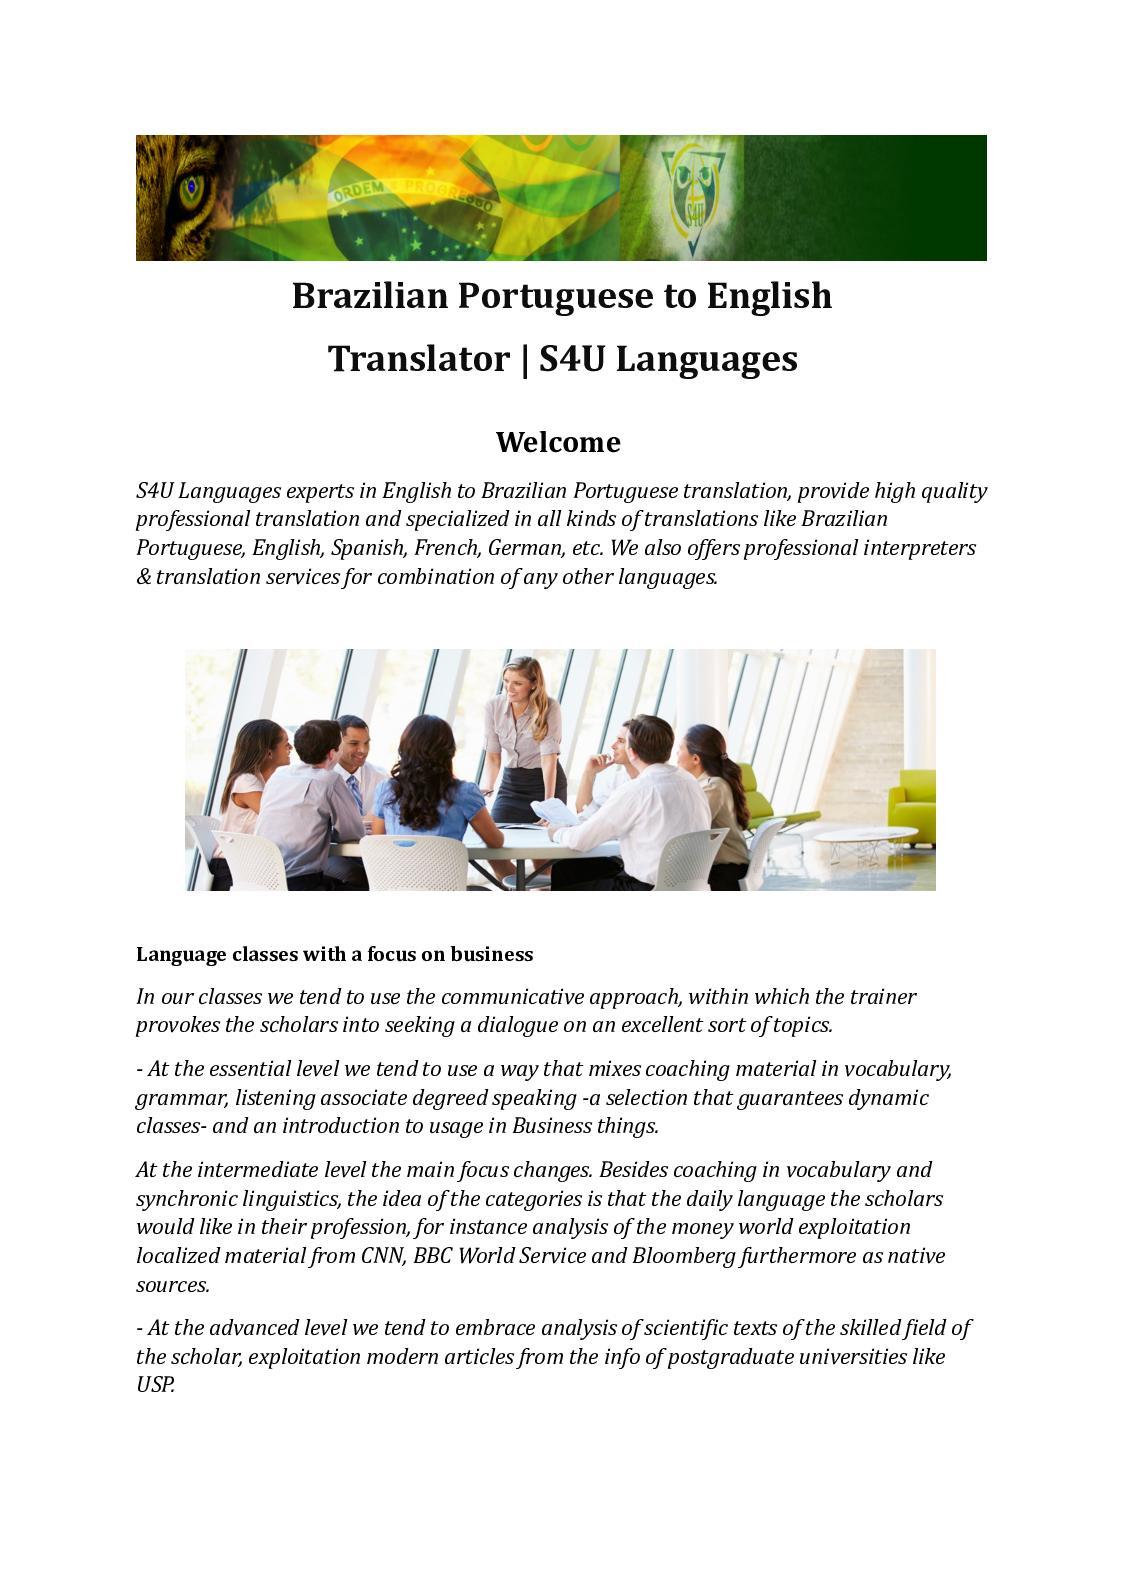 Calaméo - Brazilian Portuguese Translations